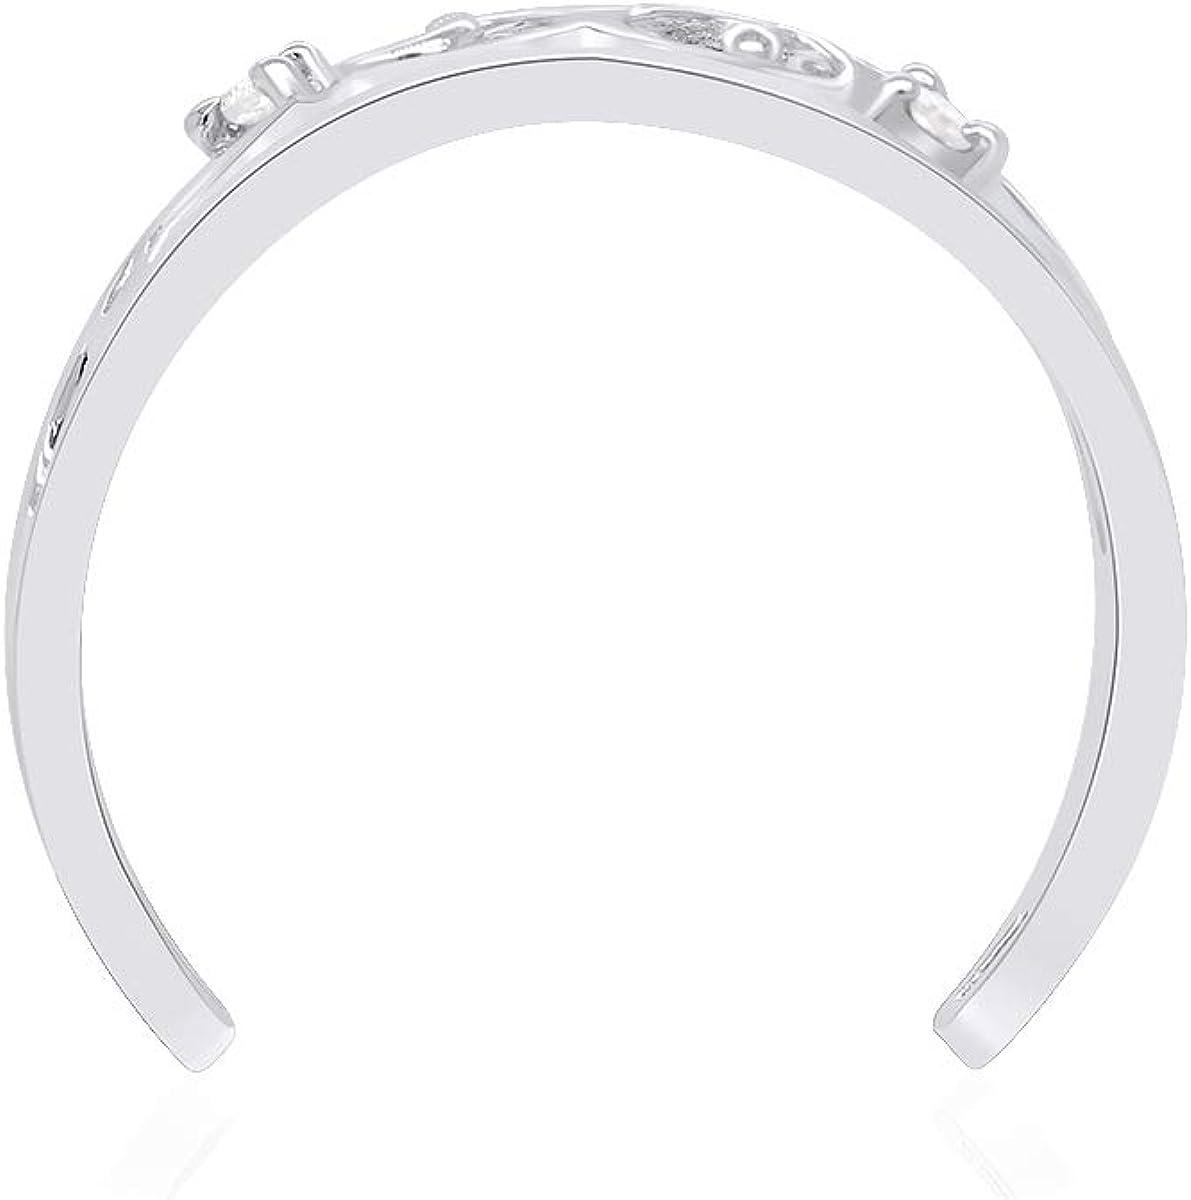 White Natural Round Diamond Accent 14k Gold Filigree Style Adjustable Toe Ring (I-J Color, I2-I3 Clarity)